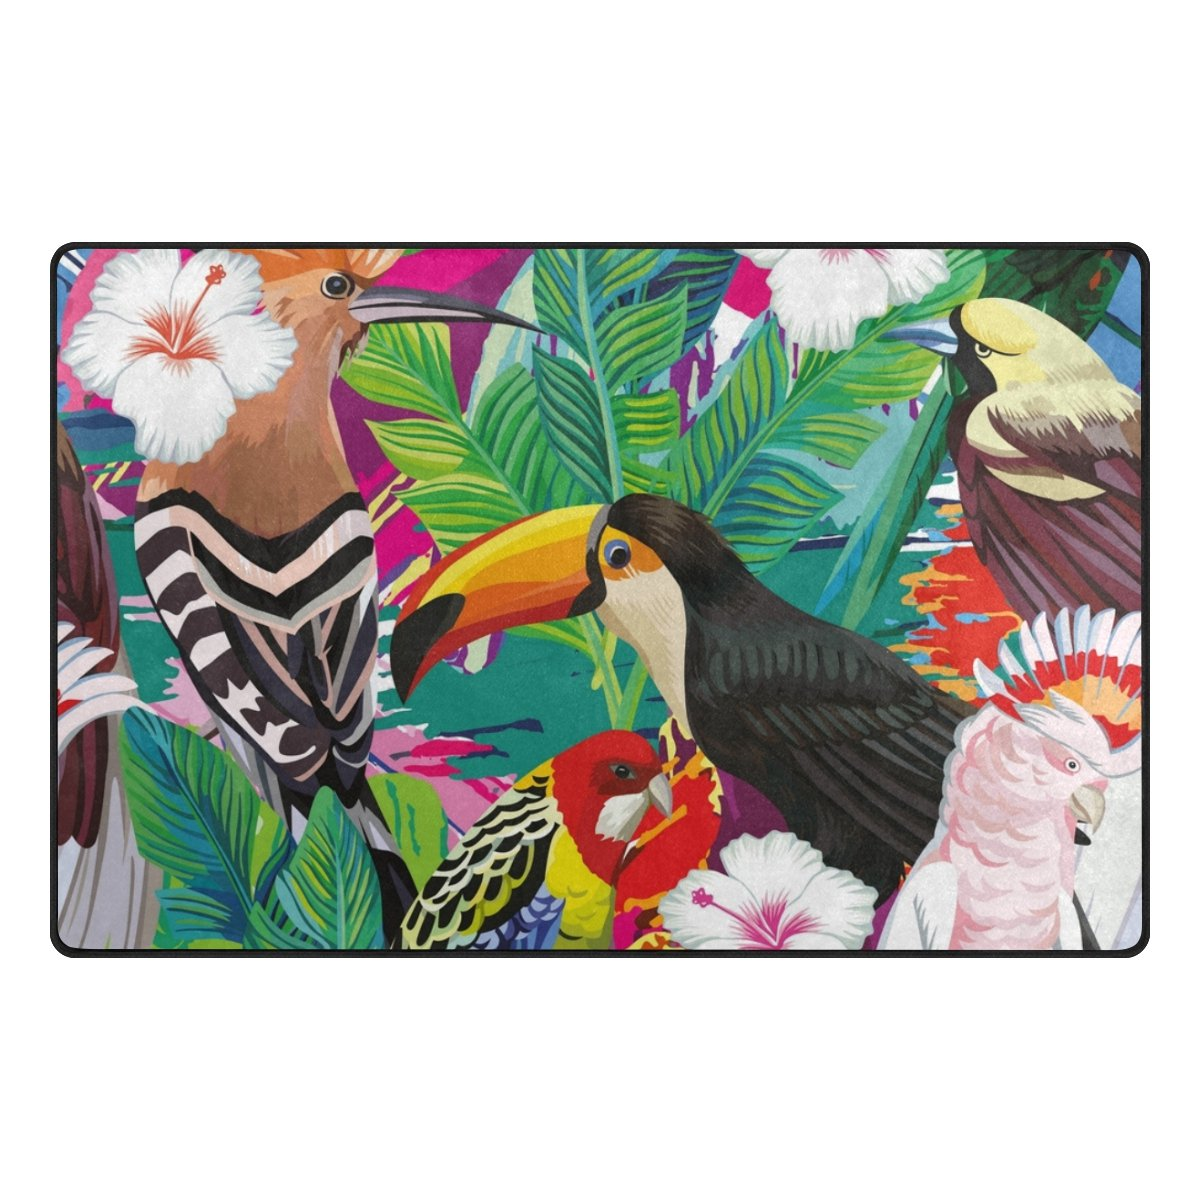 U LIFE Vintage Wild Animals World Tropical Forest Birds Floral Flowers Large Doormats Area Rug Runner Floor Mat Carpet for Entrance Way Living Room Bedroom Kitchen Office 31 x 20 Inch